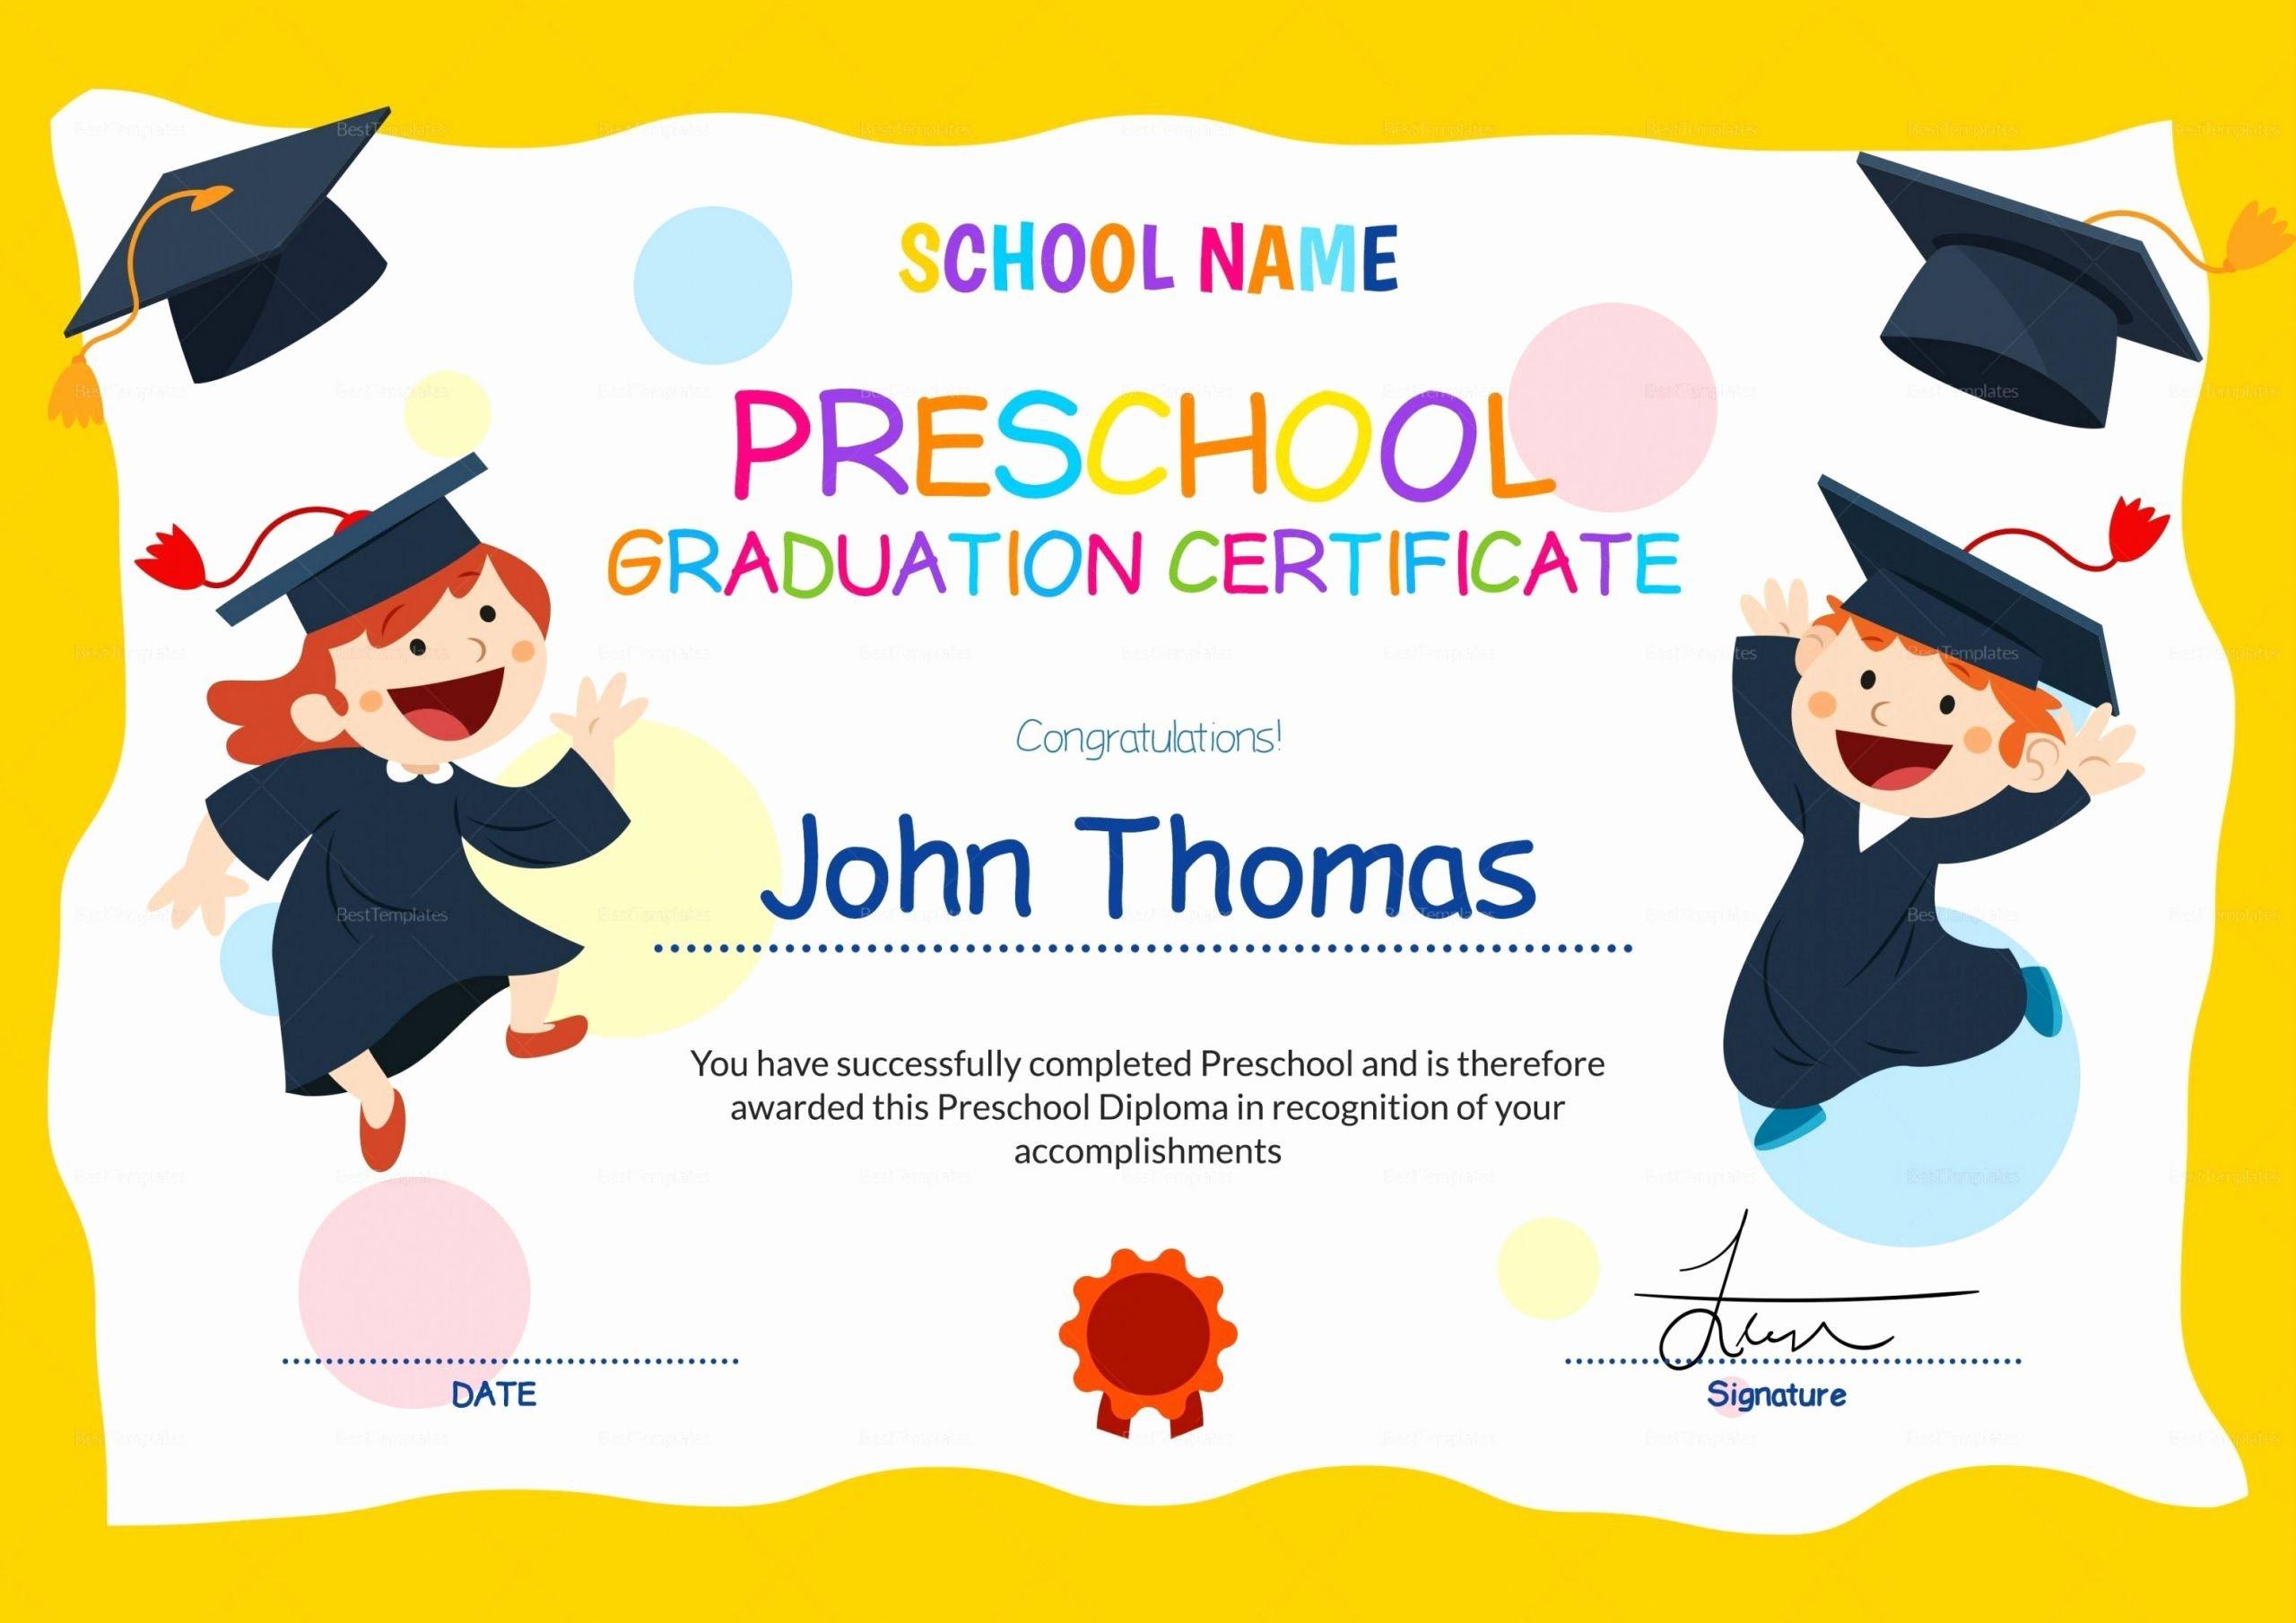 Preschool Certificate Templates Free Fresh Preschool Graduation Certificate Template